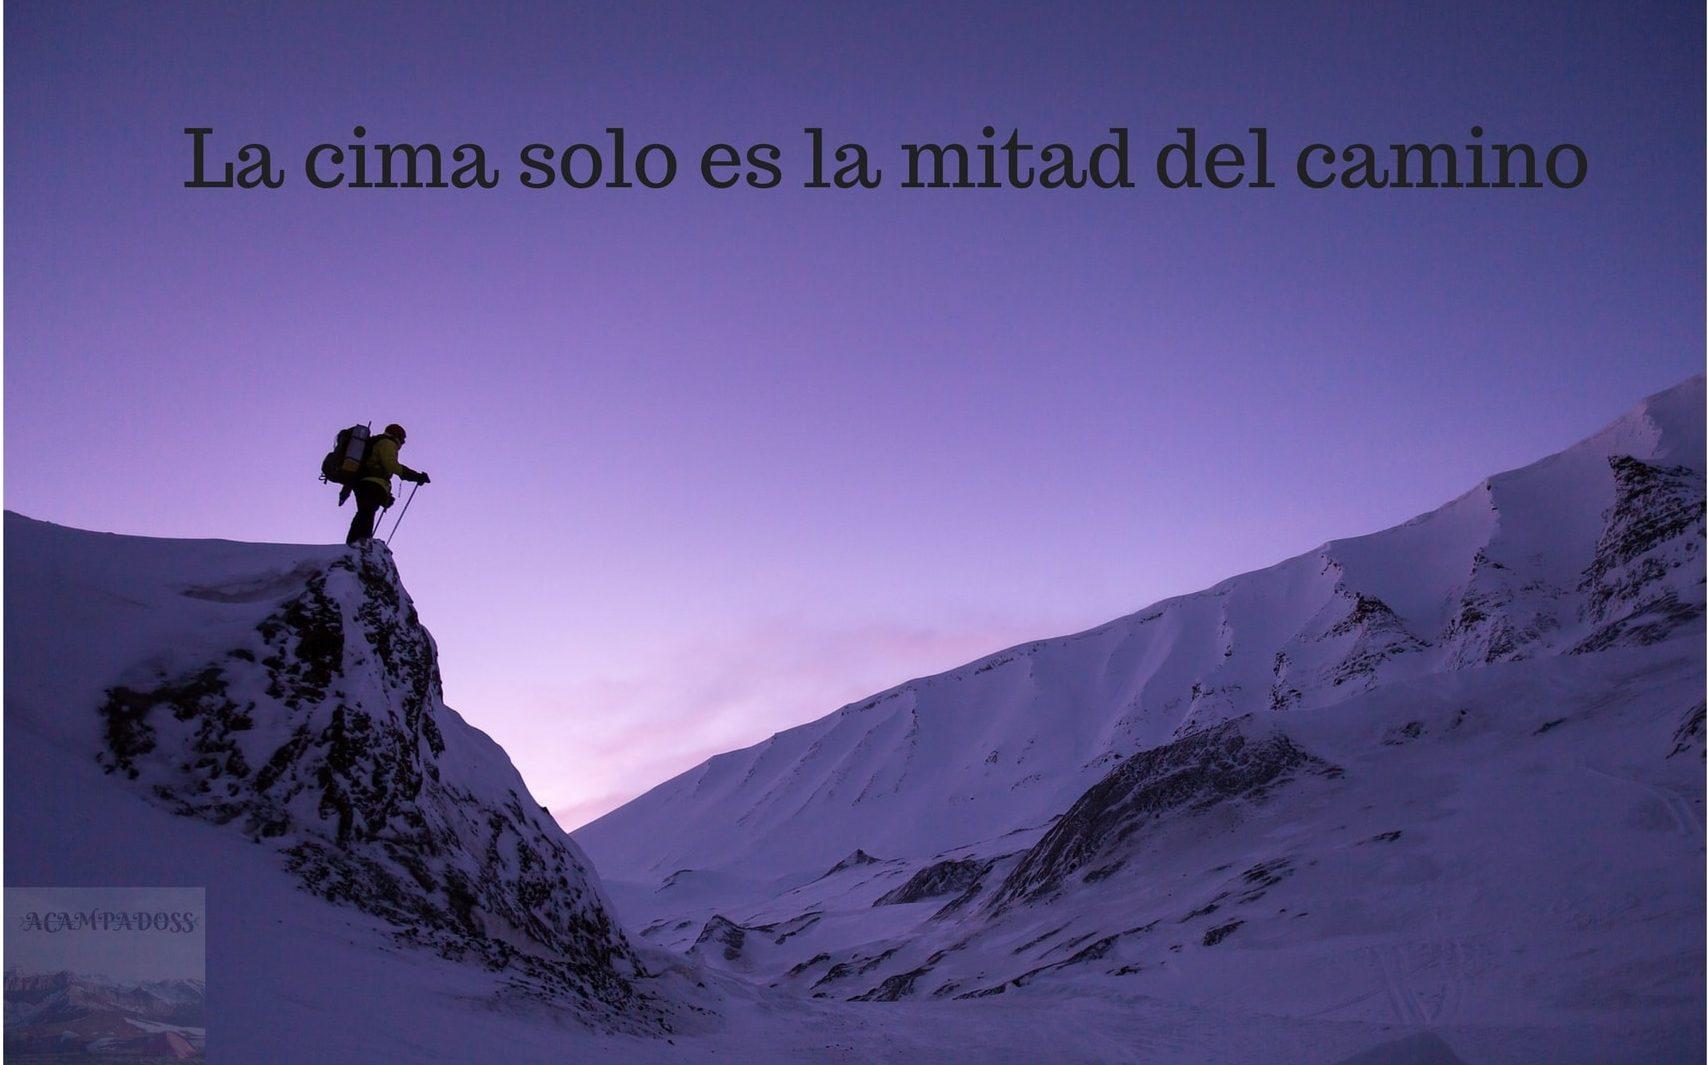 Ropa de montaña especial para subir la montaña